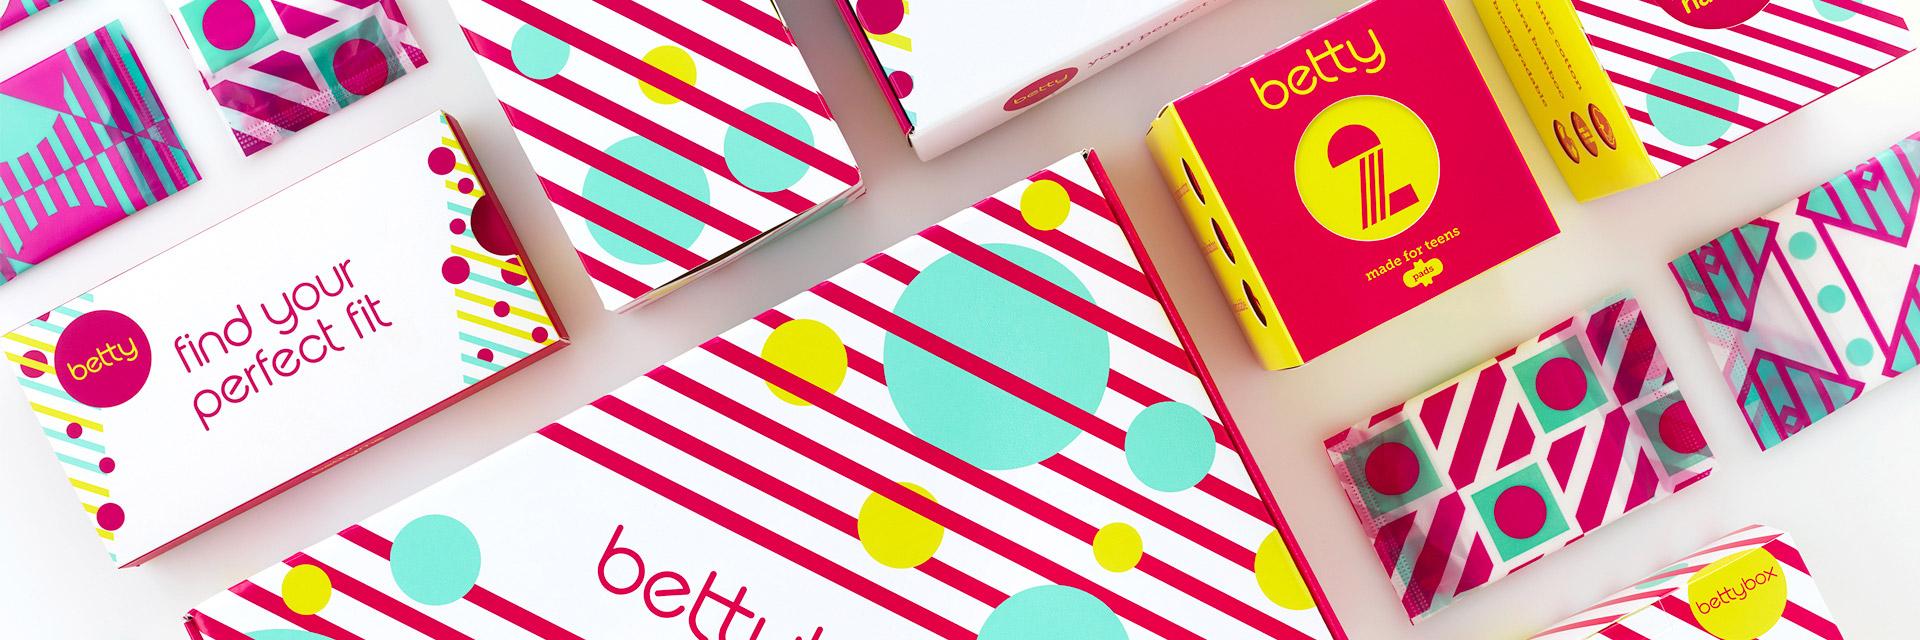 Straightforward. betty brand creation and packaging design